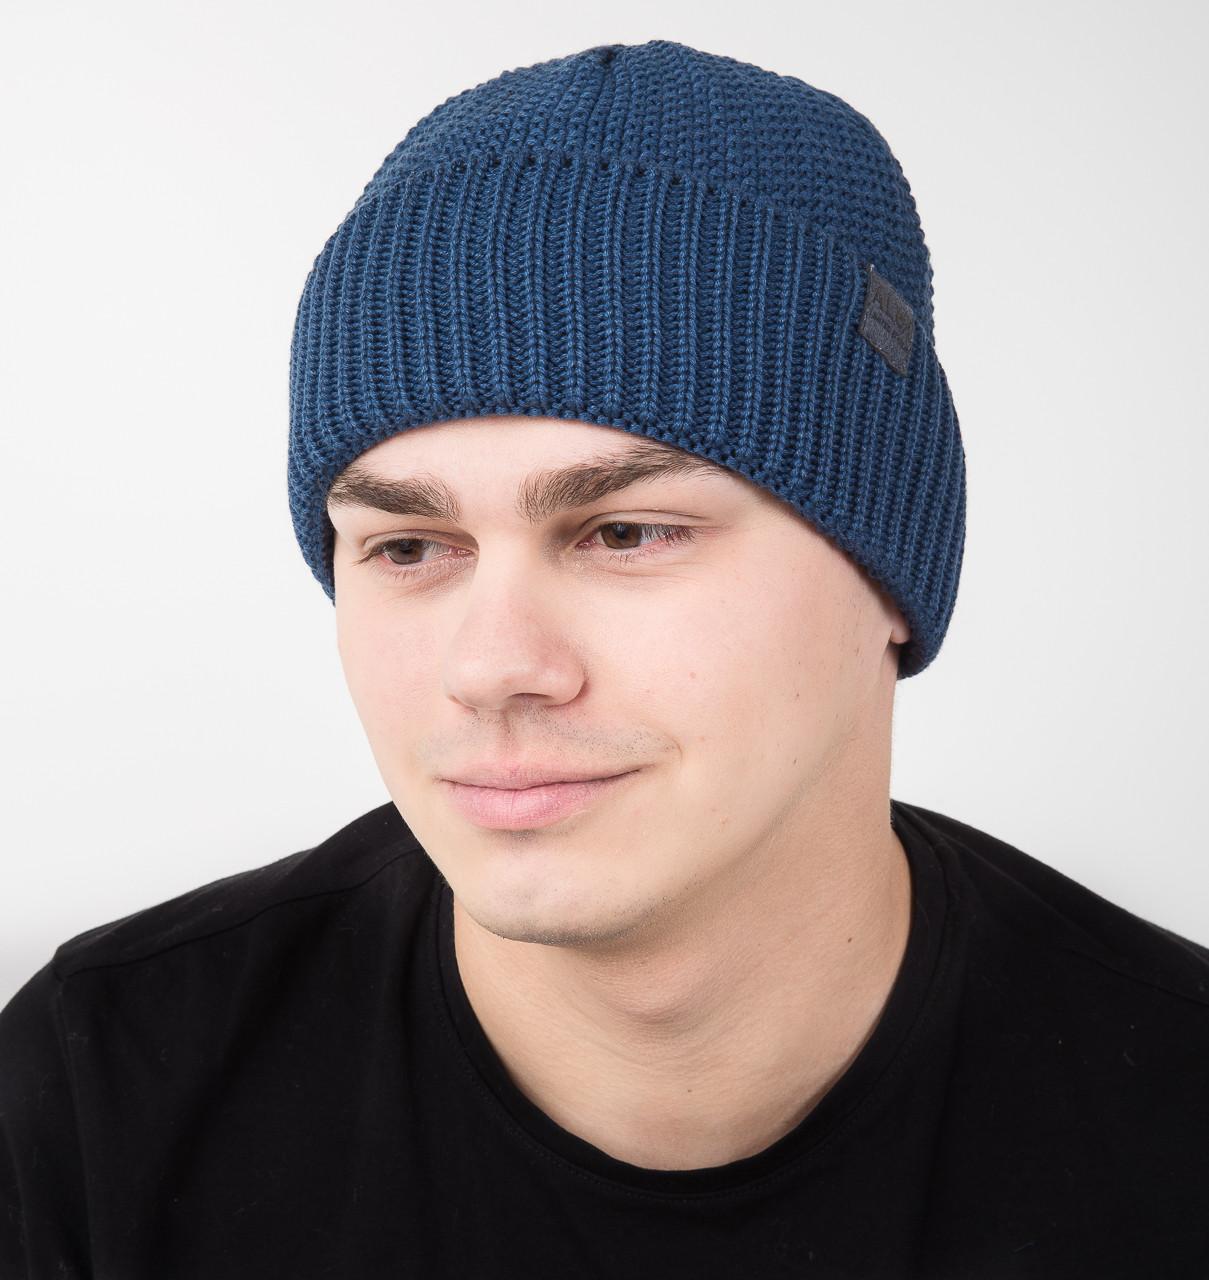 Зимняя вязаная мужская шапка на флисе - Артикул AL17036